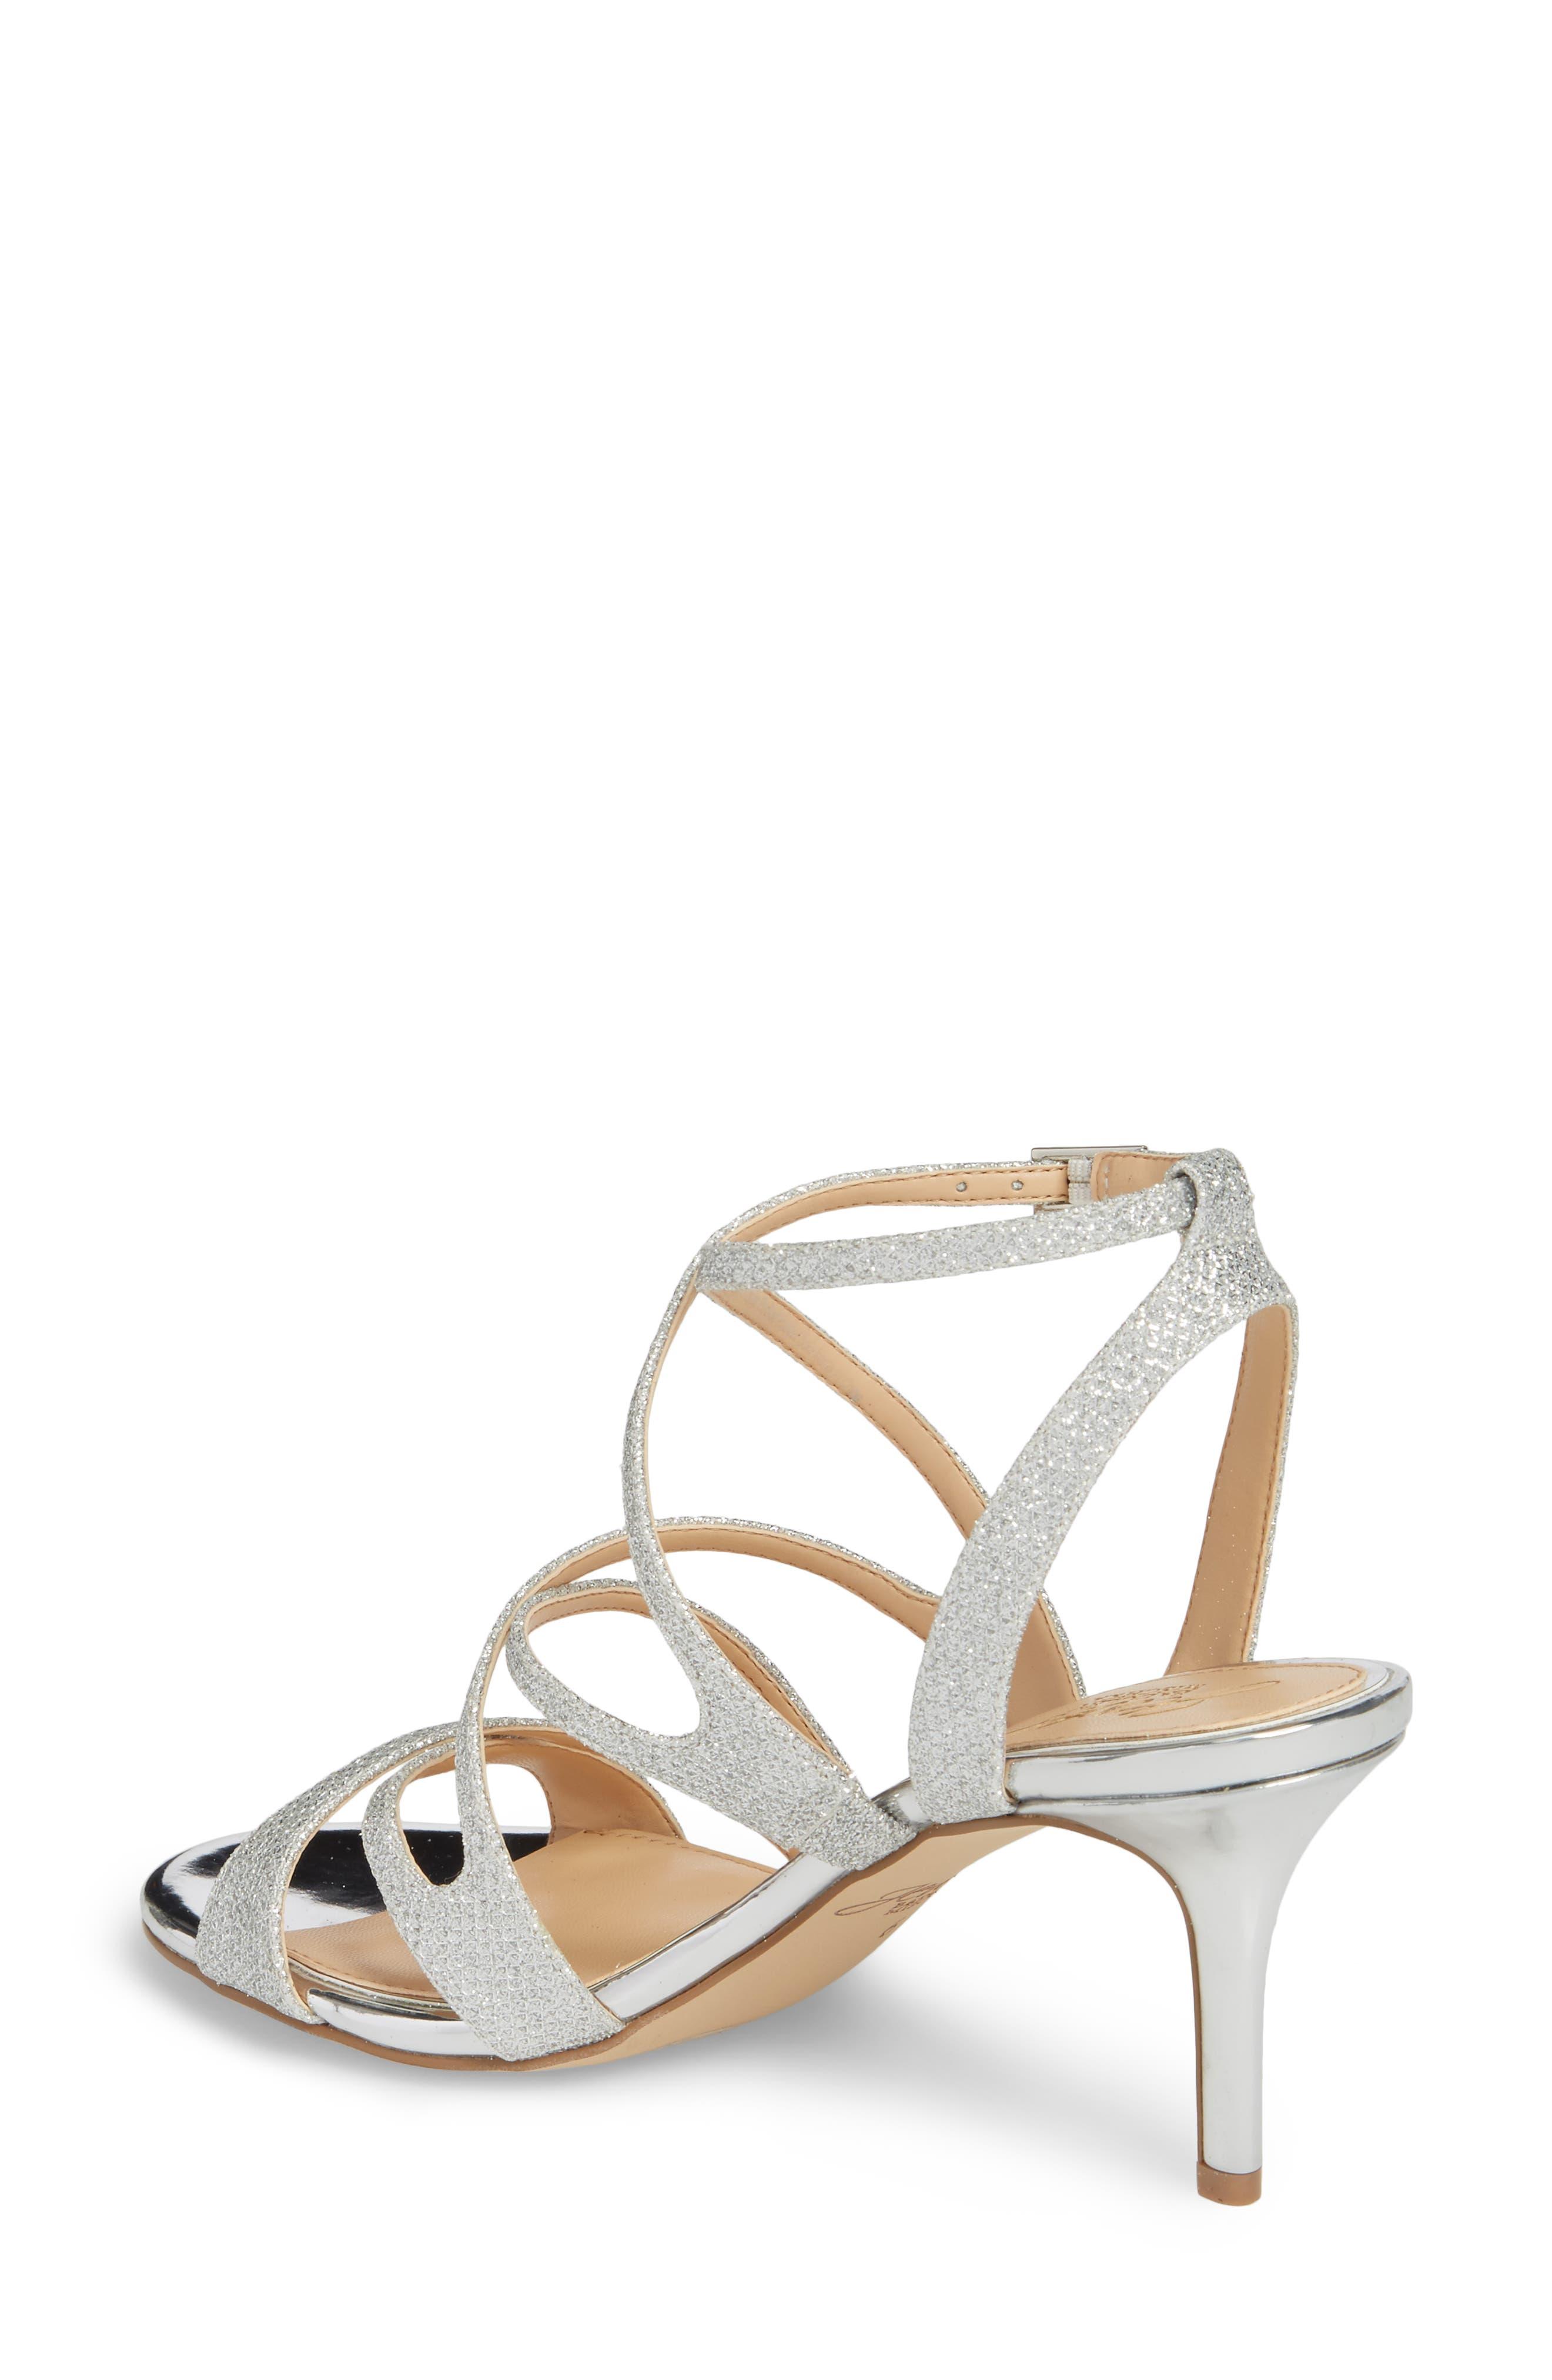 Tasha Glitter Sandal,                             Alternate thumbnail 2, color,                             043